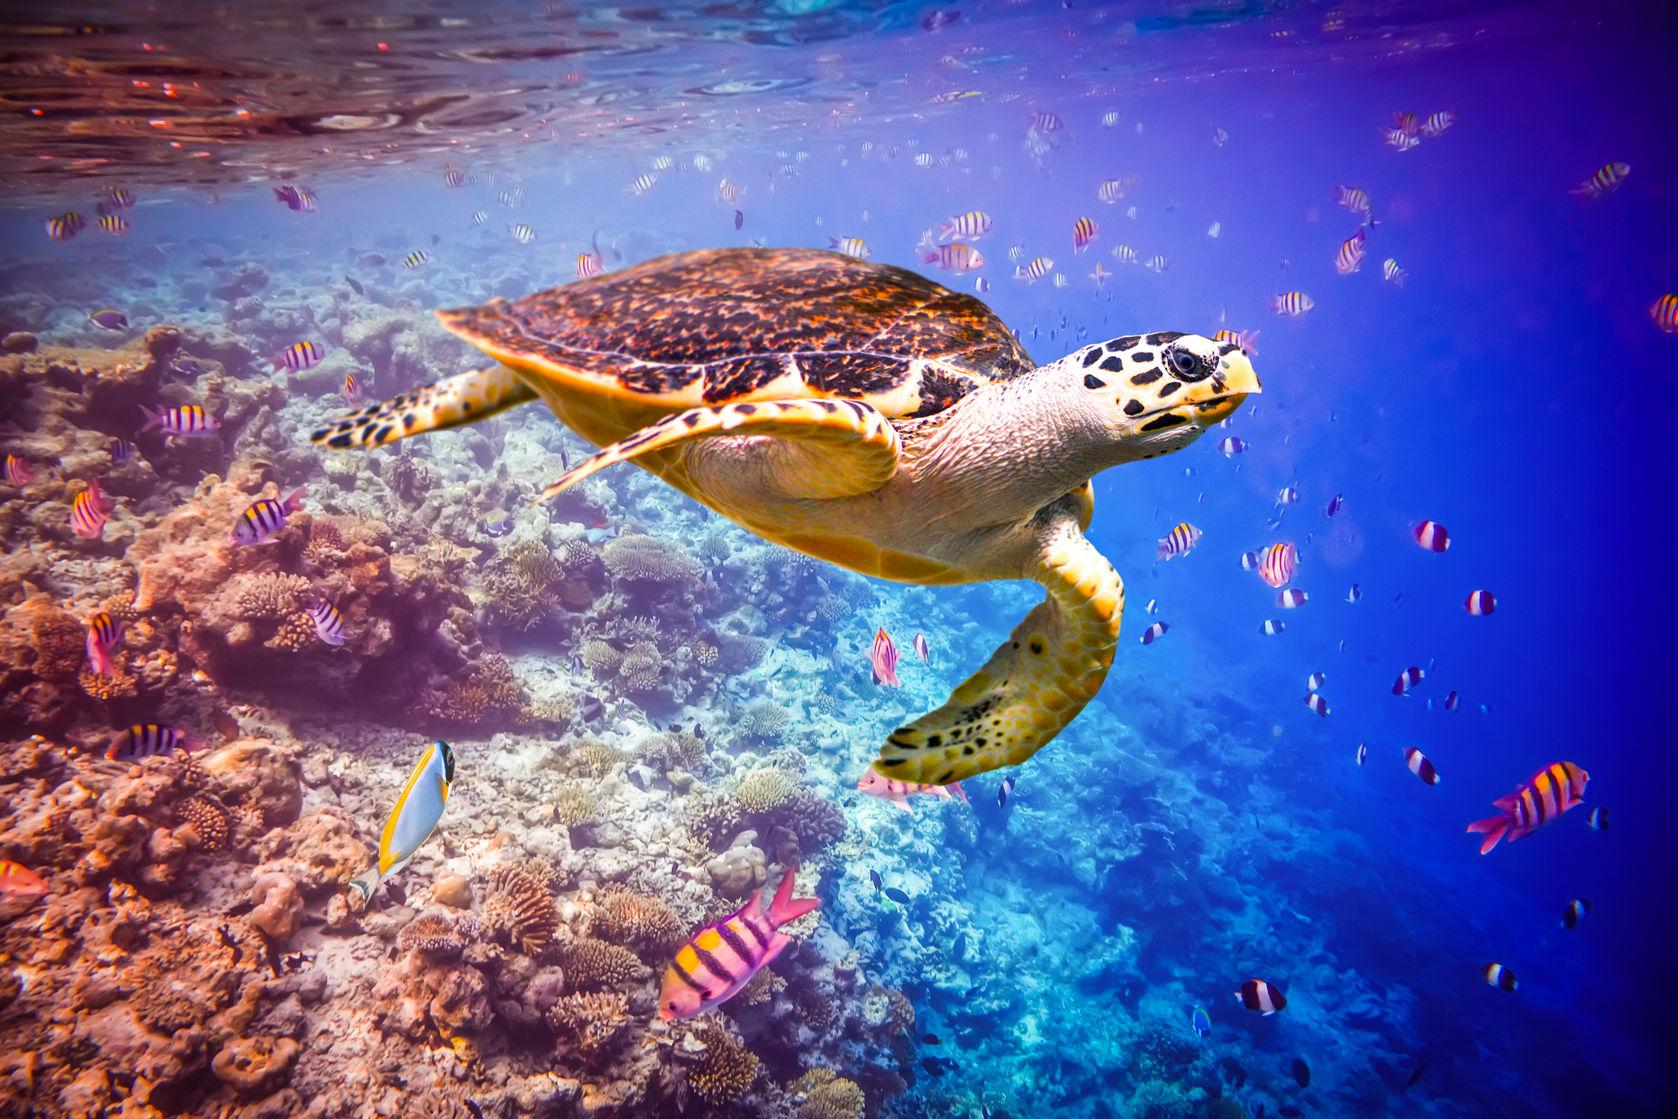 tortuga carey animales marinos caribe colombiano - 123rf